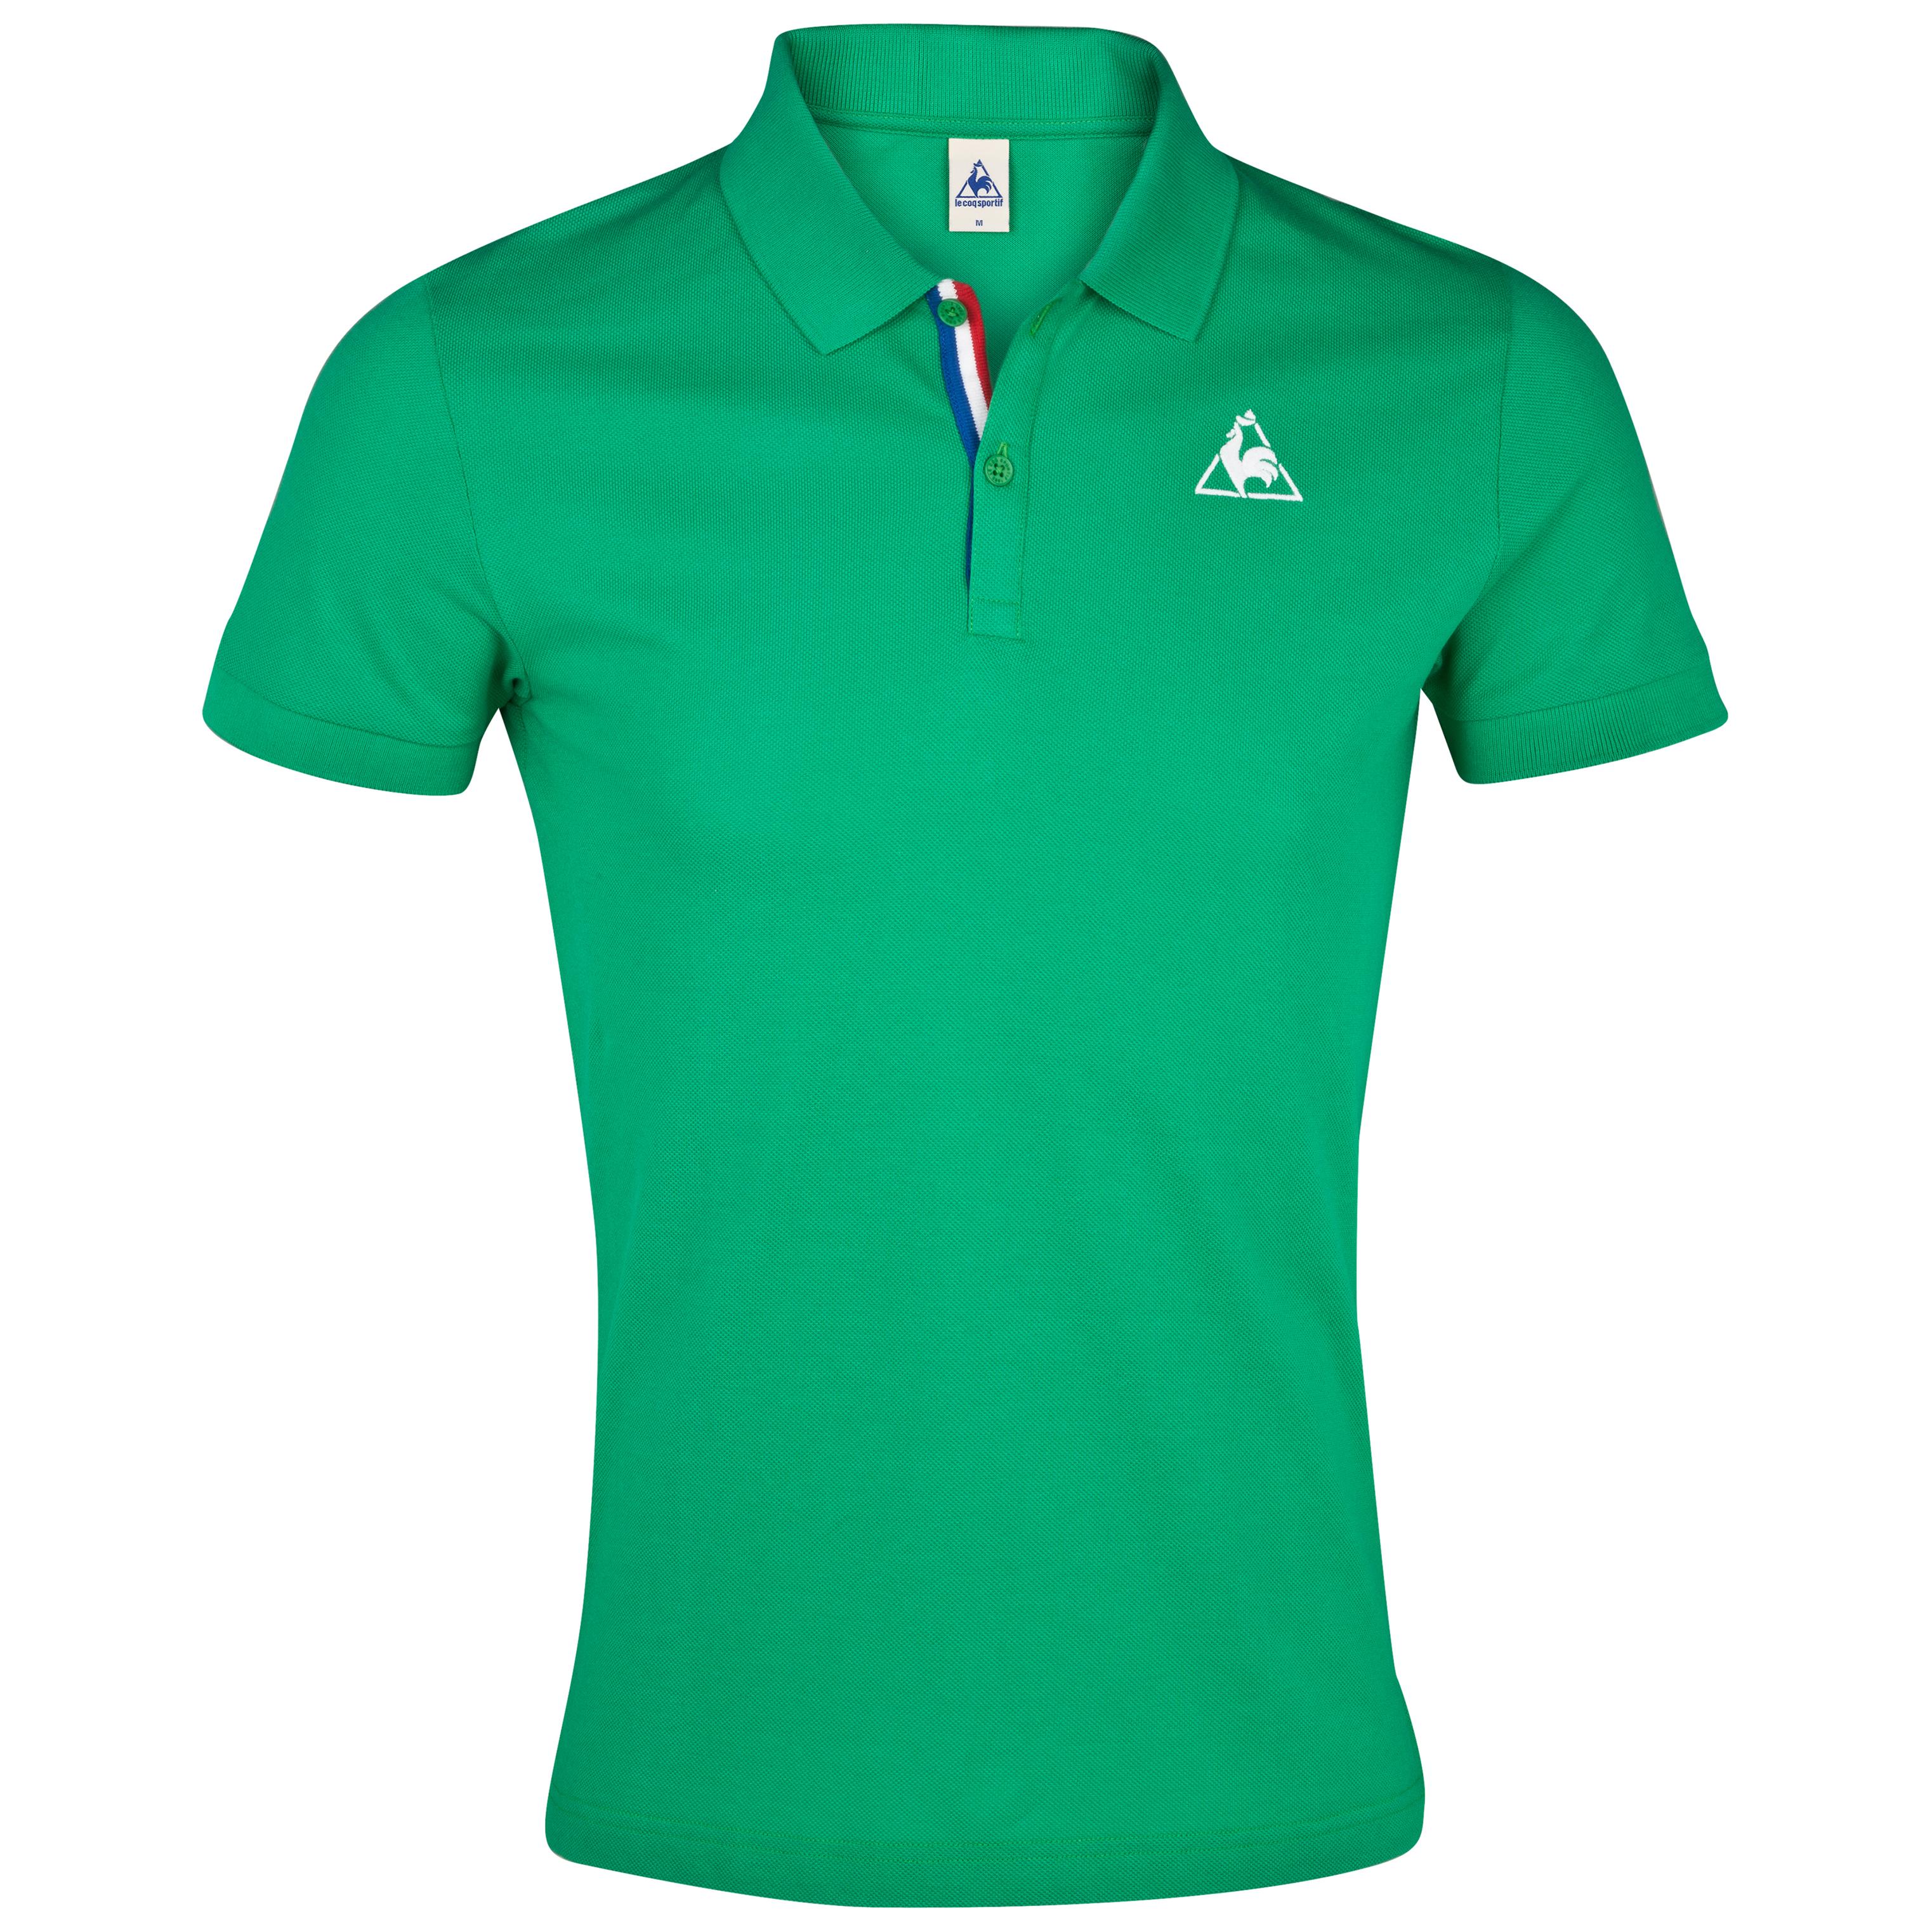 Le Coq Sportif Aspot Polo - Green St Etienne